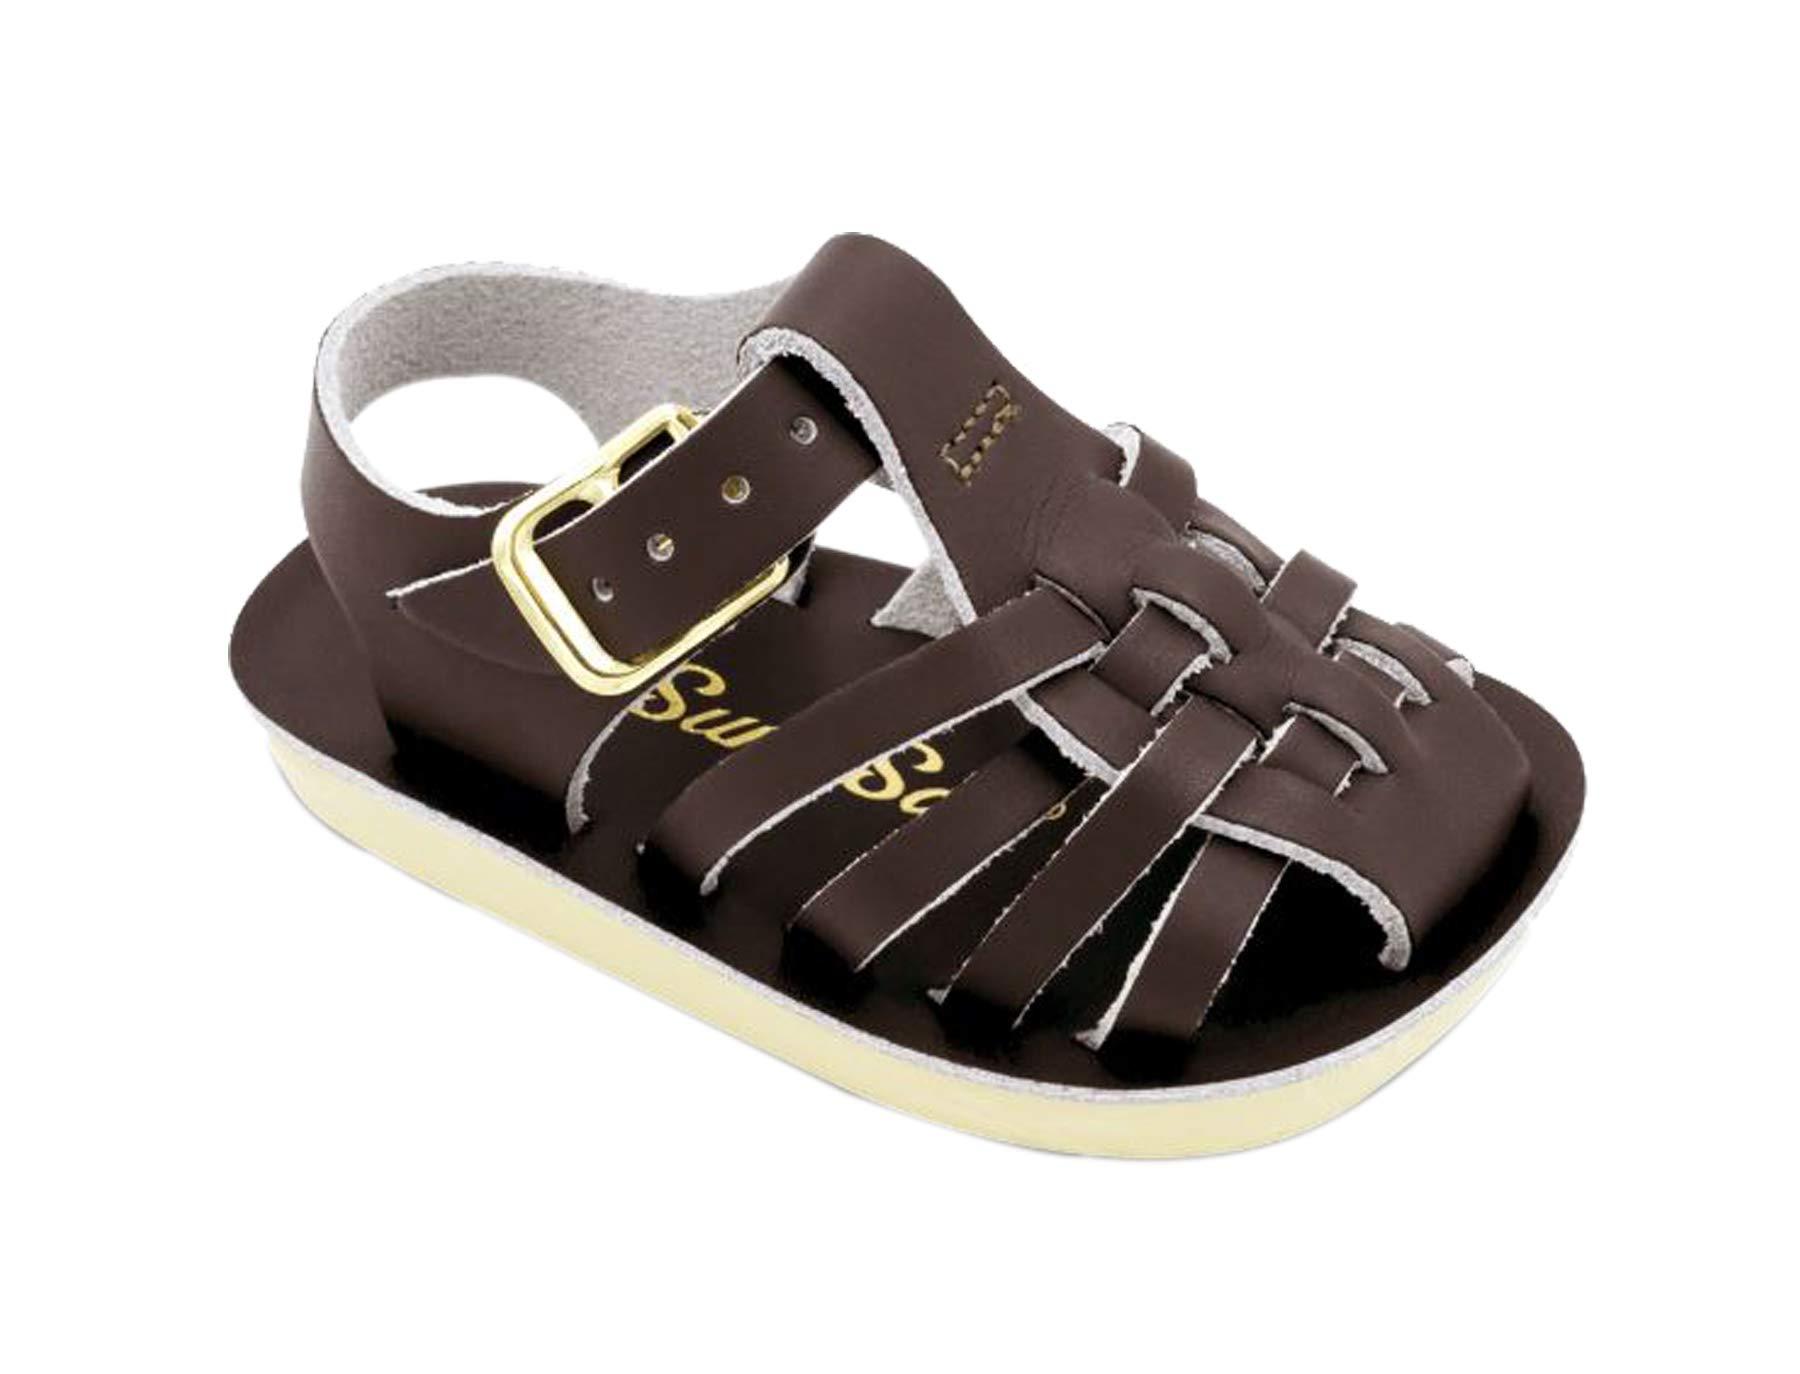 Salt Water Sandals by Hoy Shoe Girls' Sun-San Sailor Flat Sandal Brown 3 M US Infant by Salt Water Sandals